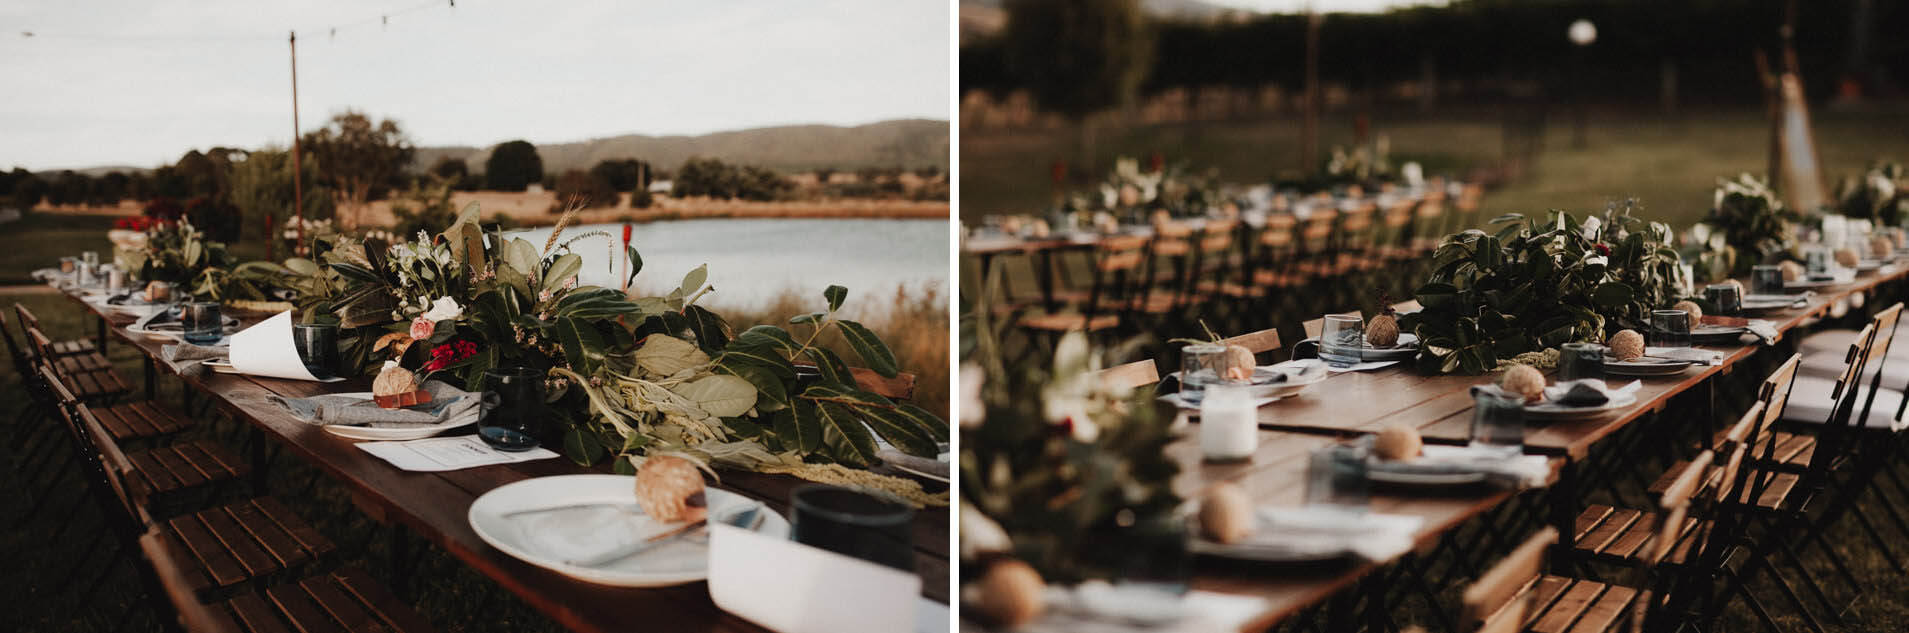 suger-pine-walk-wedding (Corinna & Dylan)_196(3127)2.jpg